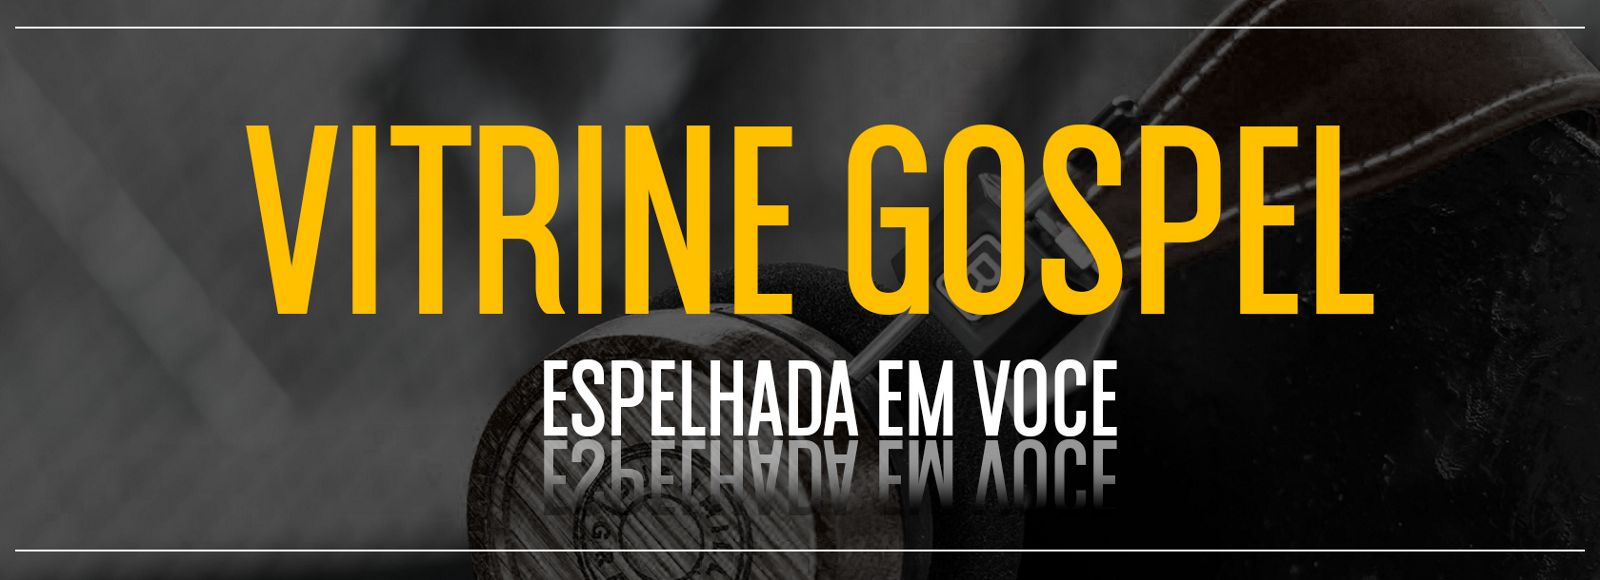 VITRINE GOSPEL